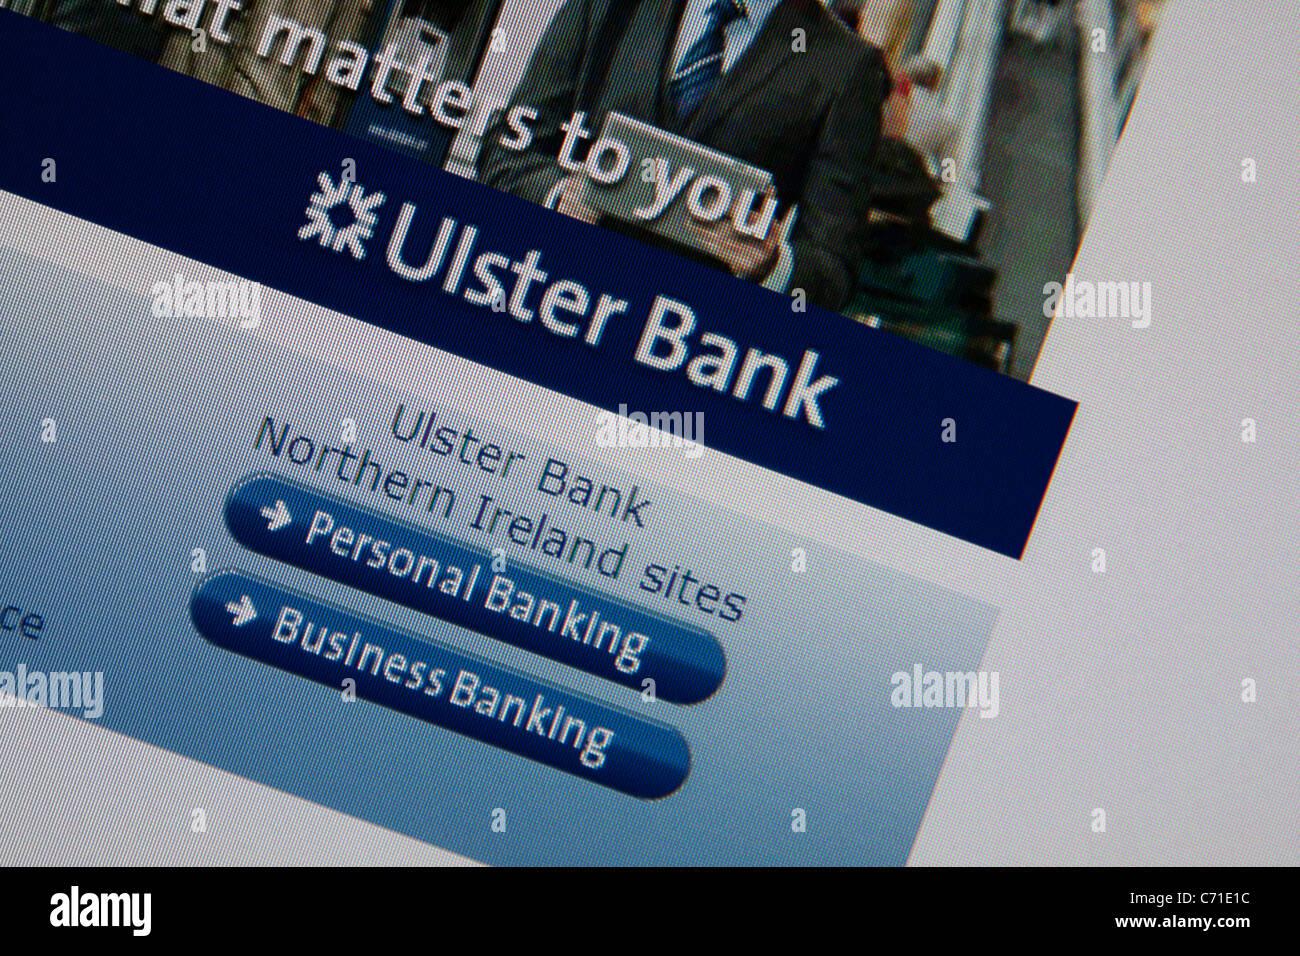 ulster bank - Stock Image